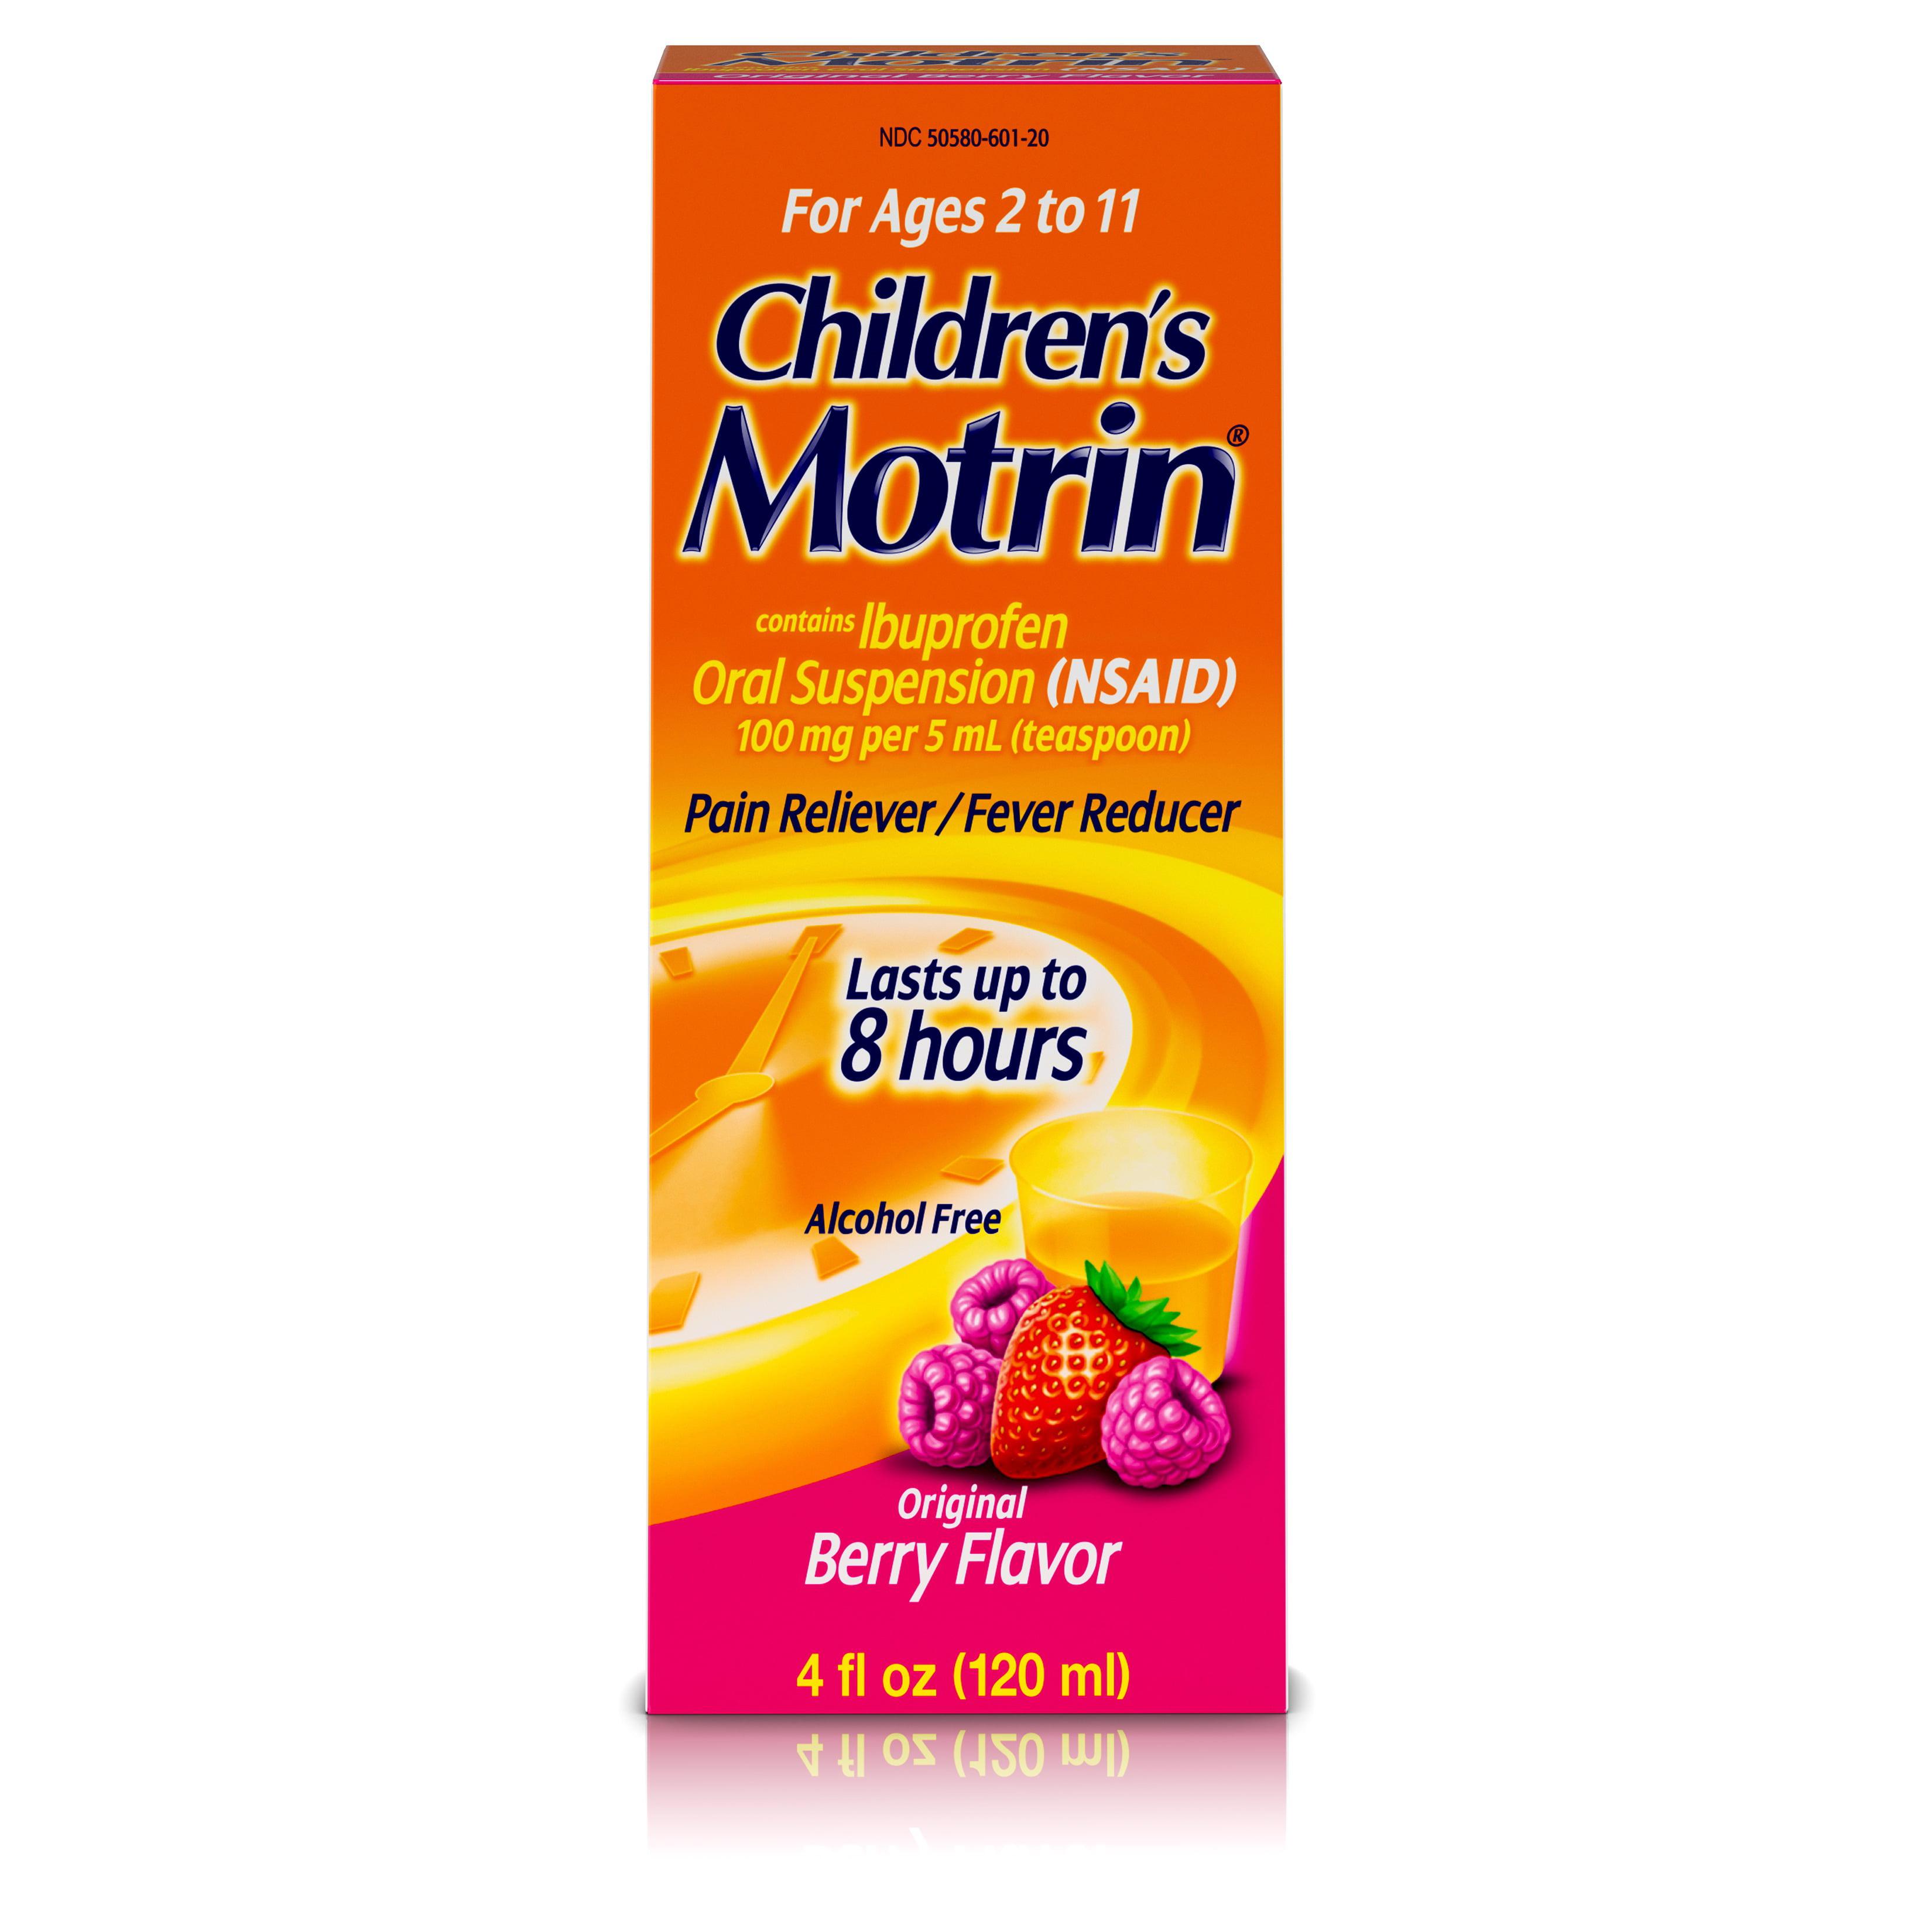 Children's Motrin Oral Suspension, Ibuprofen,Pain Relief, 4 Oz